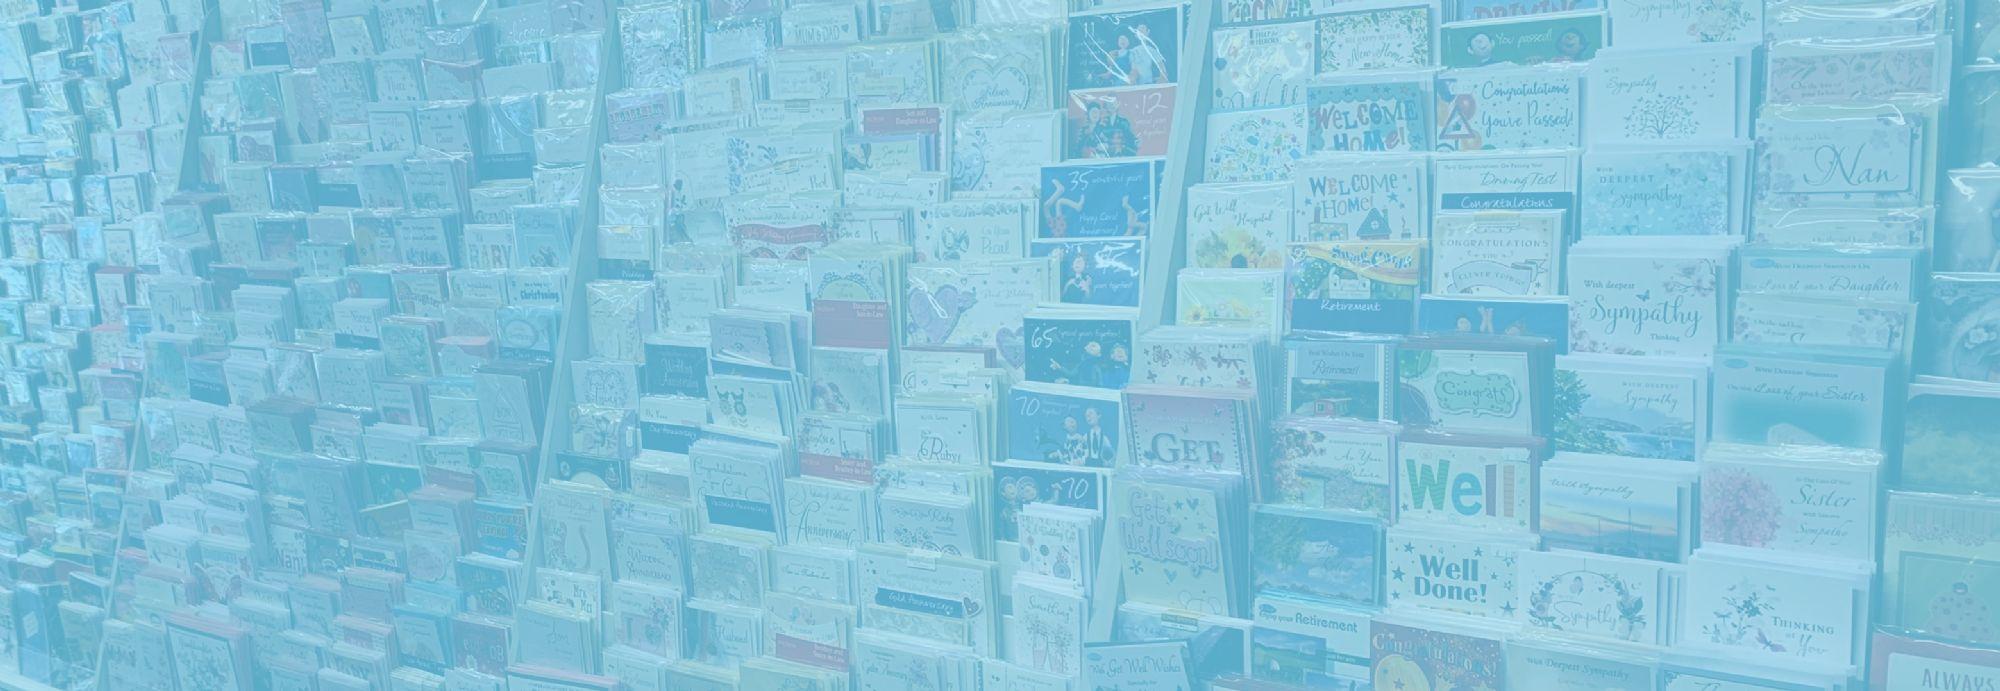 cards blue tint